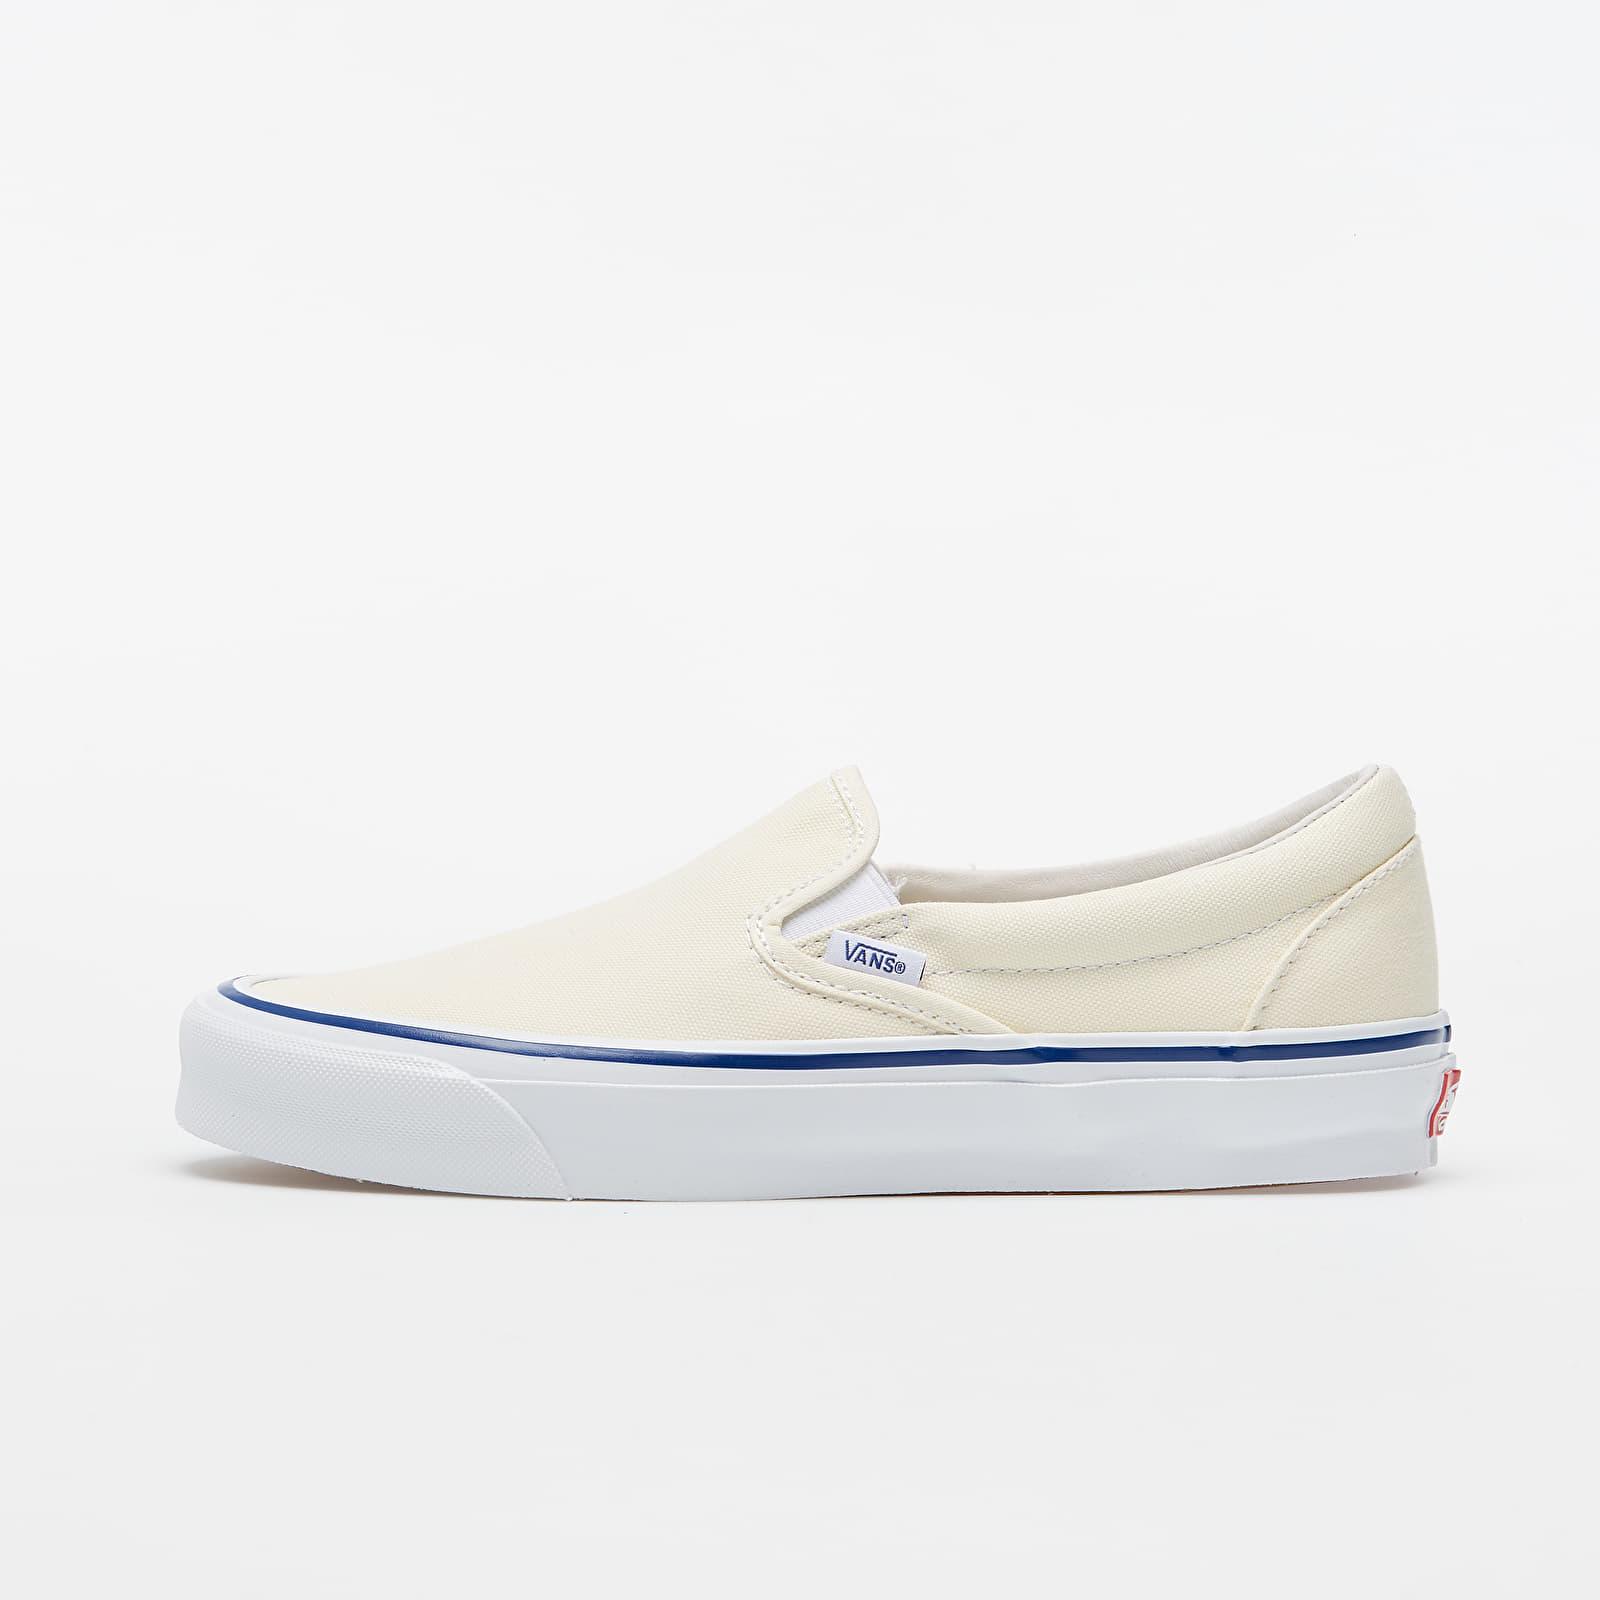 Men's shoes Vans OG Classic Slip-On (Canvas) Classic